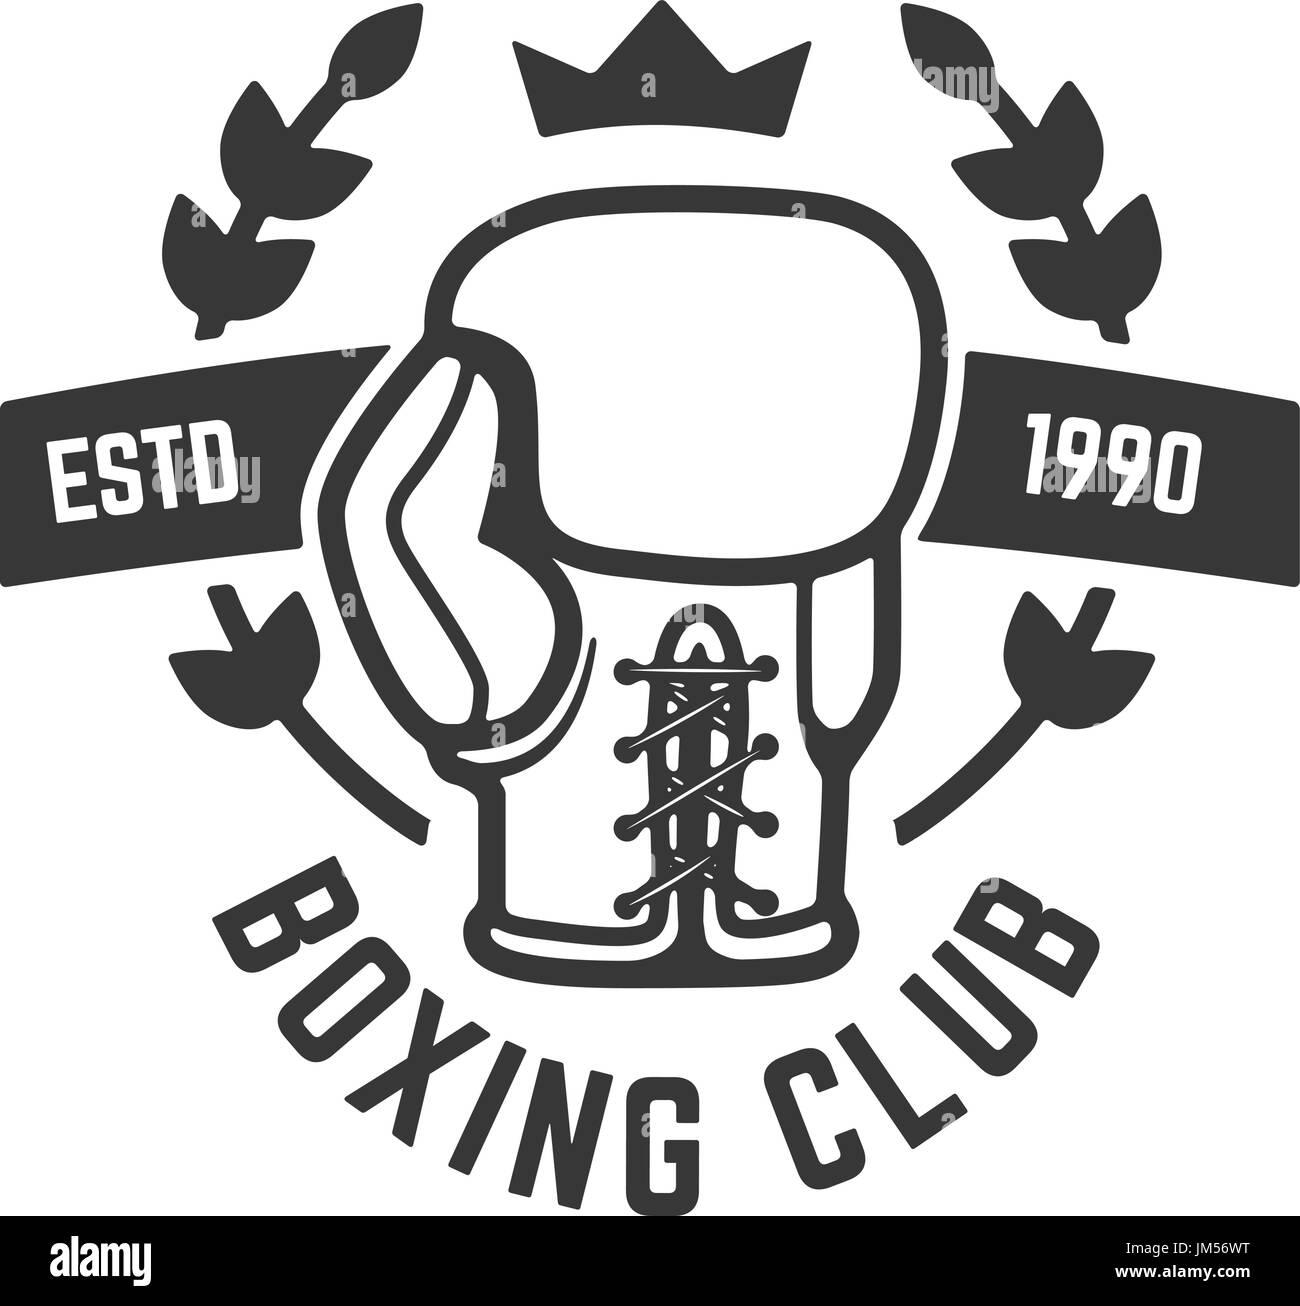 Boxing Club-Emblem Vorlage. Boxhandschuh. Gestaltungselement für ...